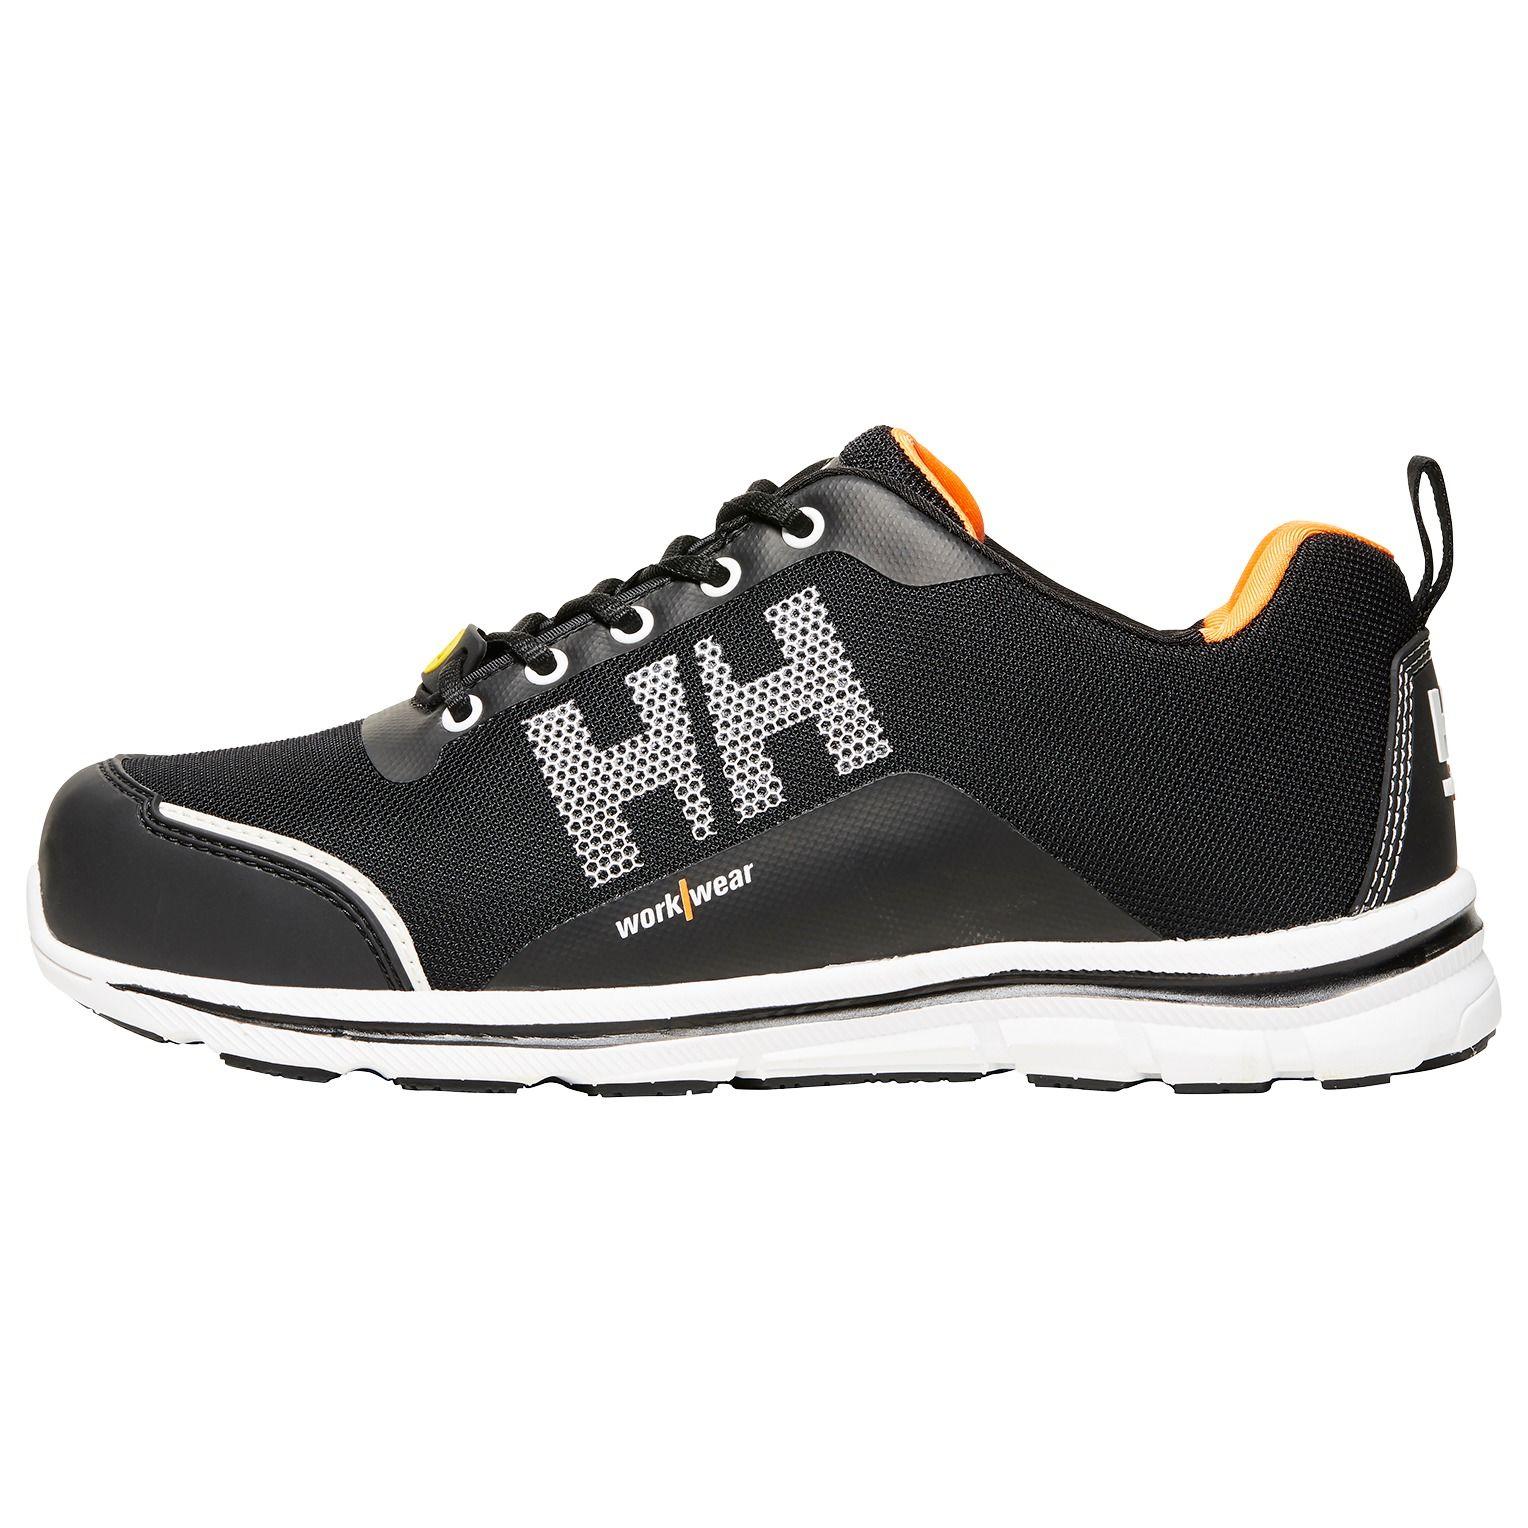 2efd3514e09 Zapatos de seguridad con tejido transpirable   Comprar zapatos de ...